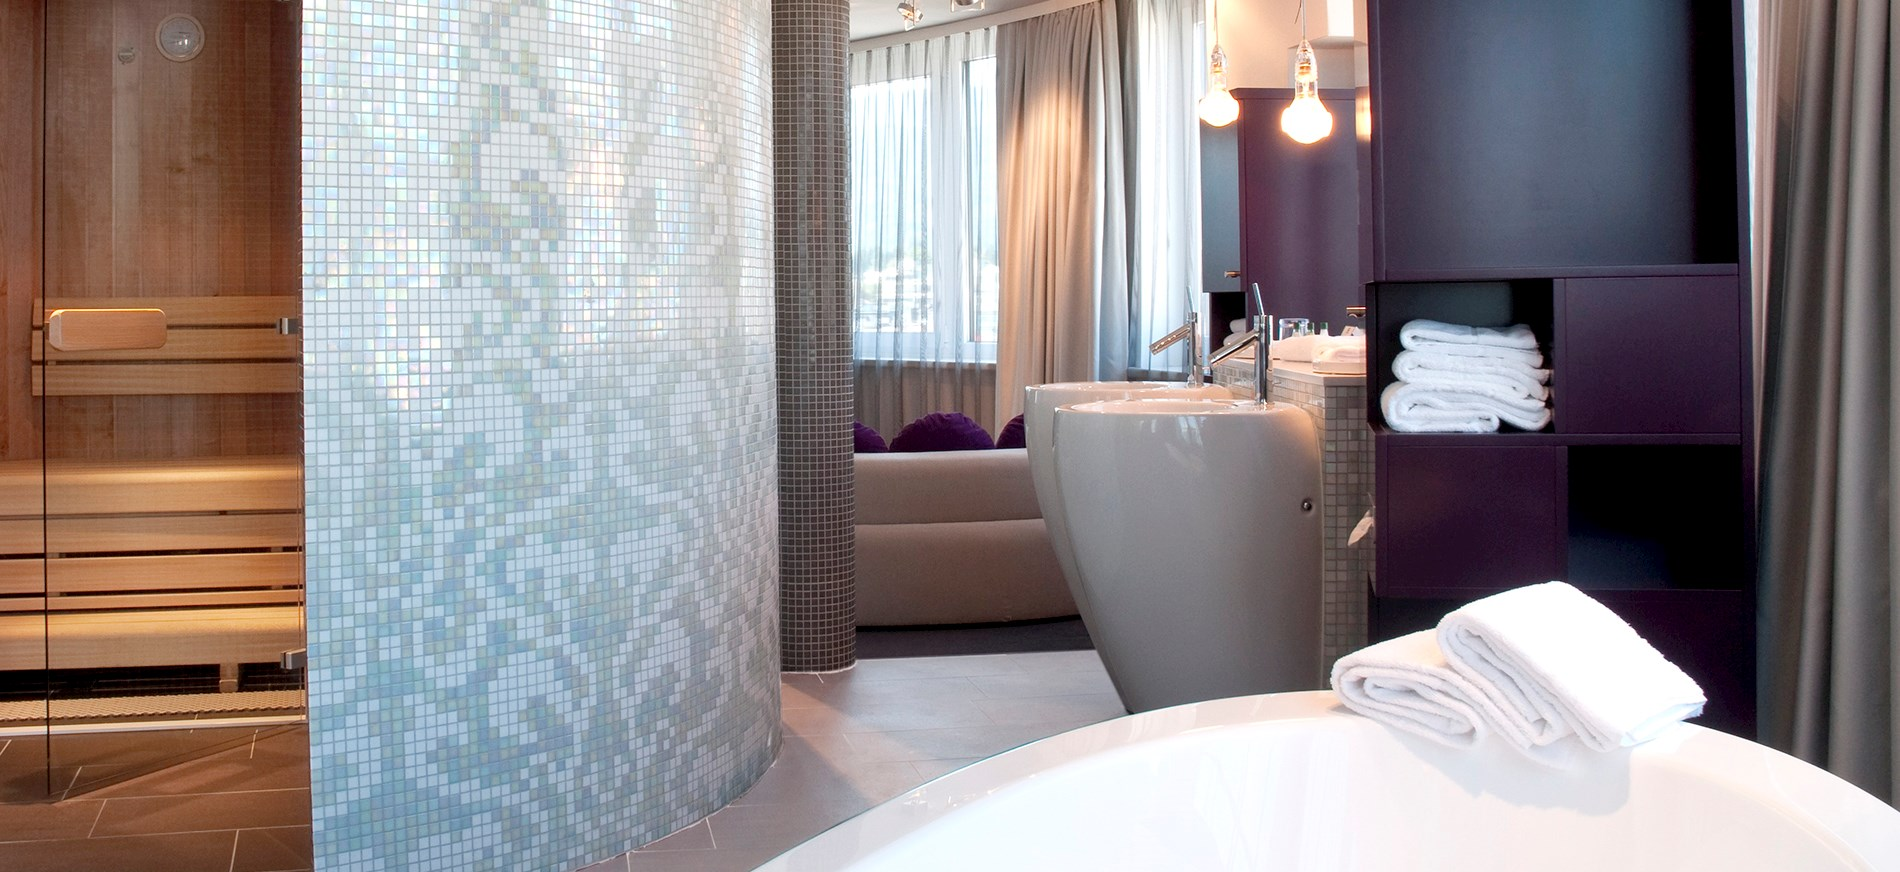 wellness suite, Badezimmer ideen